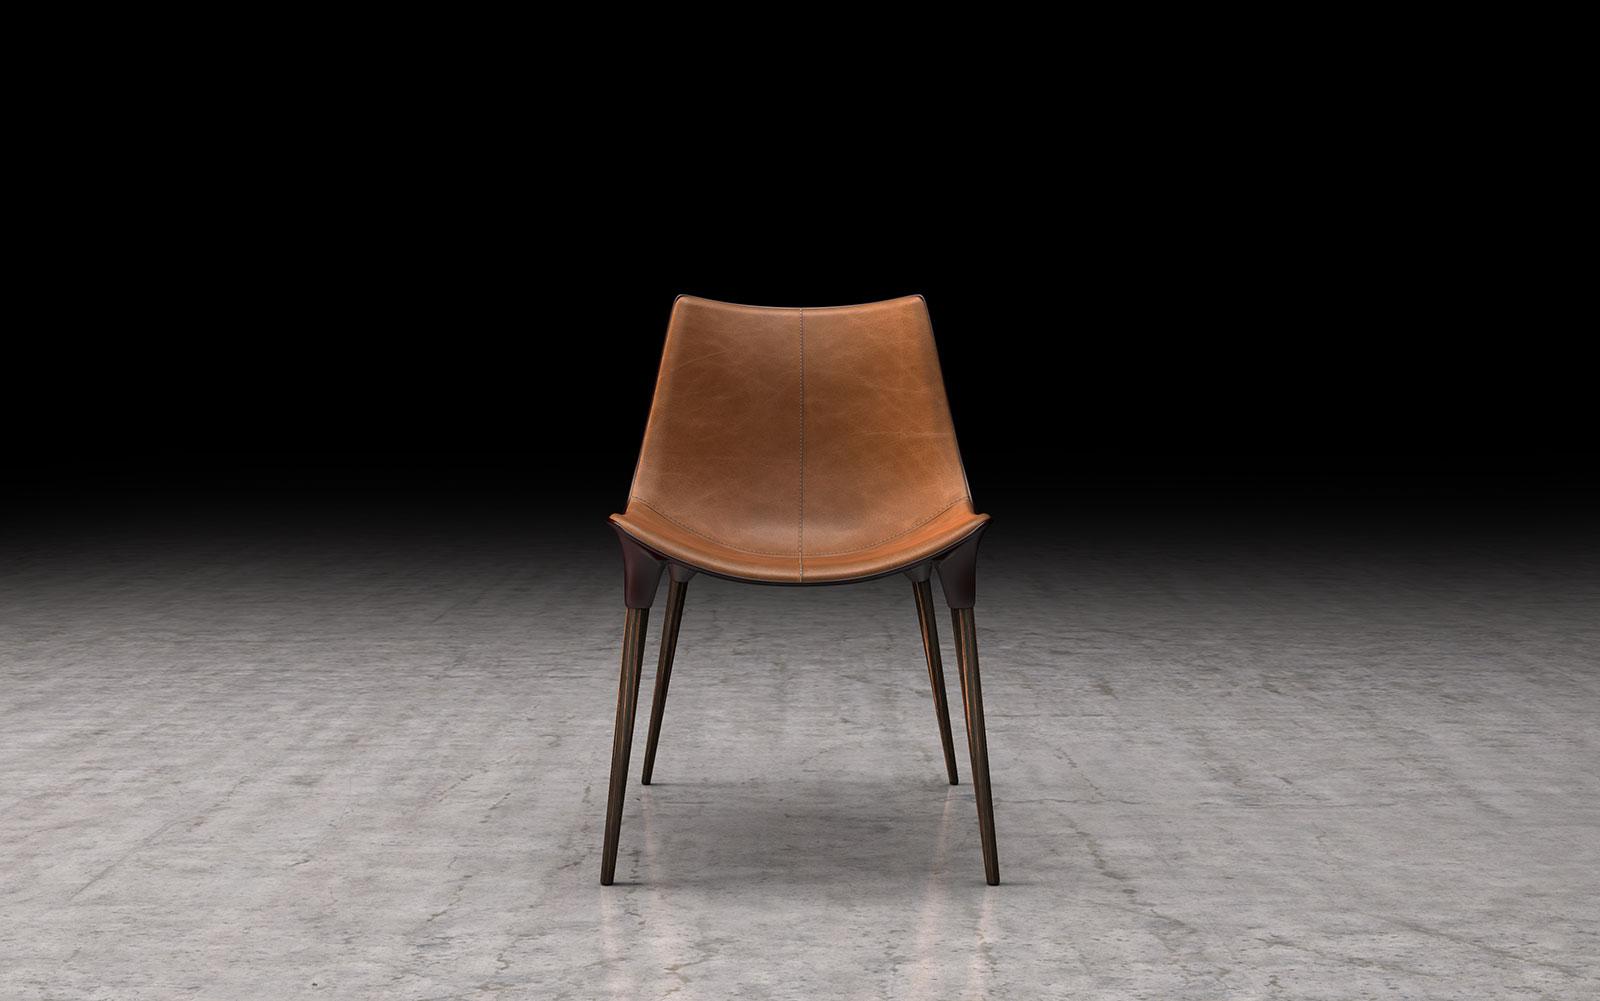 2M LANGHAM Bijan Interiors Toronto 39 S Modern Furniture Store